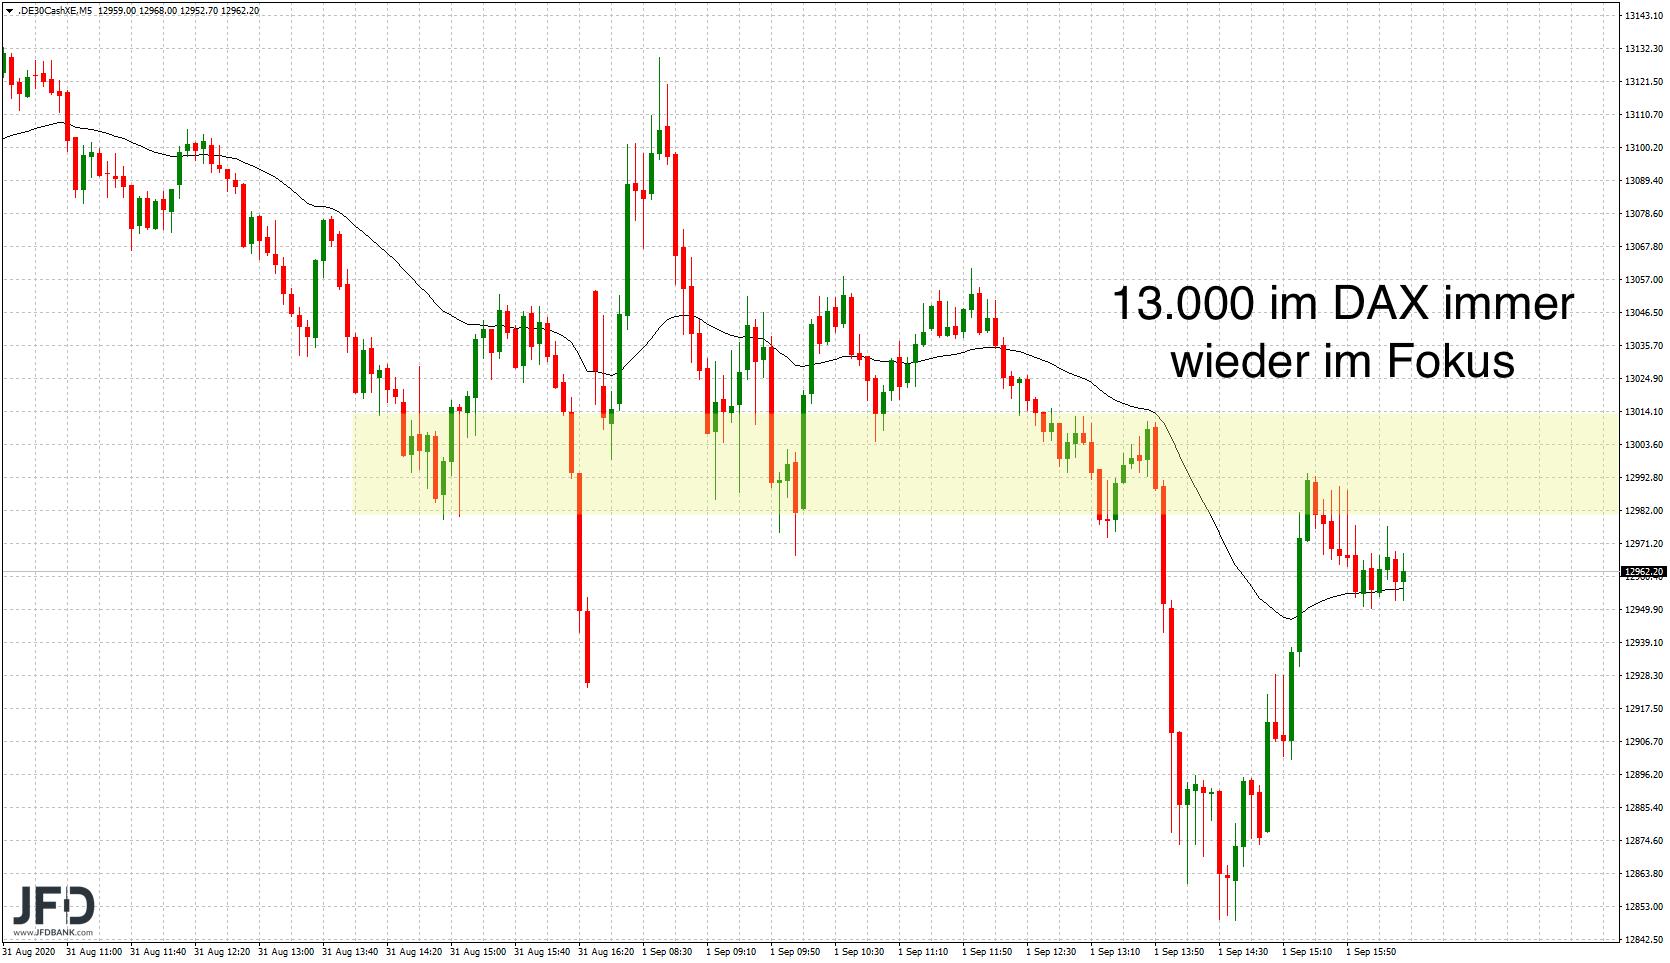 DAX-volatil-in-den-September-gestartet-Kommentar-JFD-Bank-GodmodeTrader.de-6